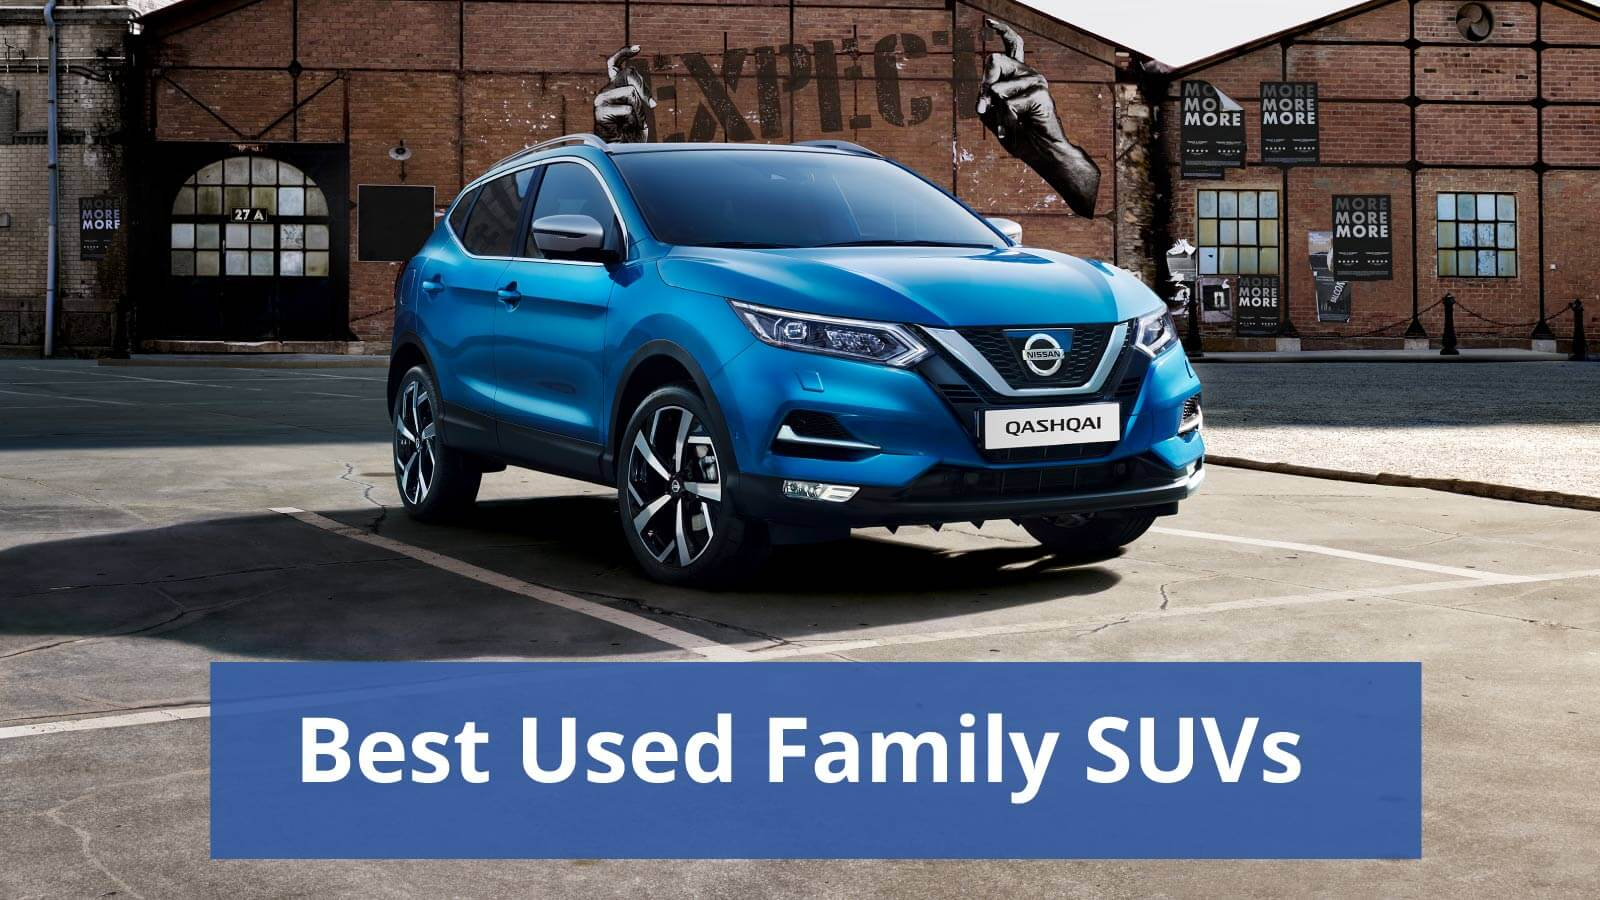 Best Used Family SUVs